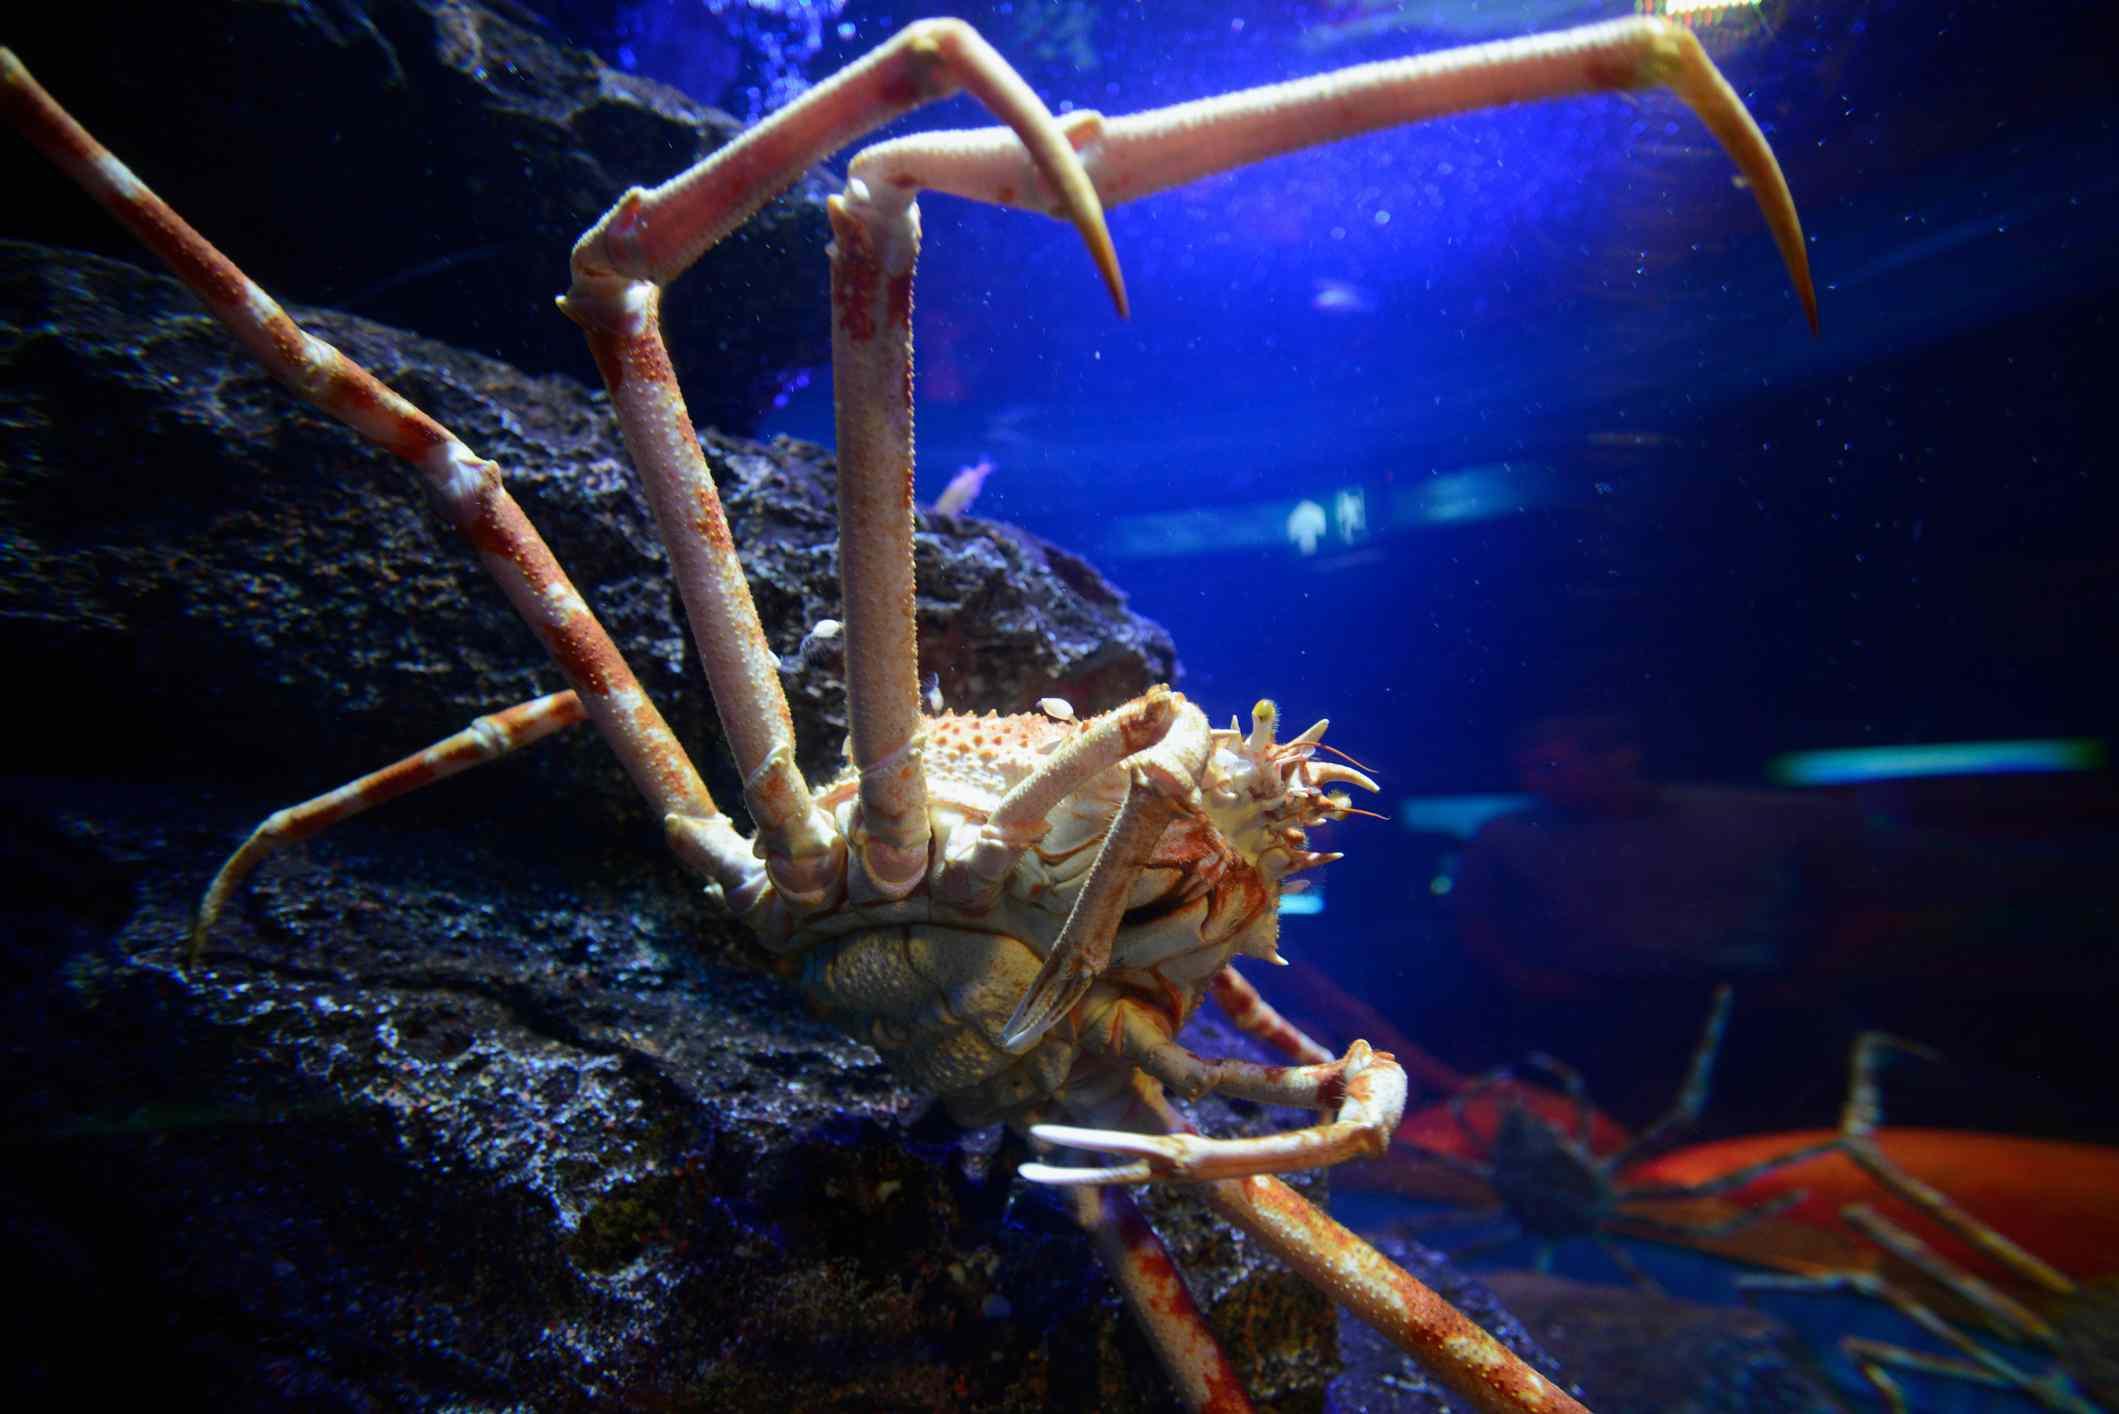 Close-Up Of Spider Crab with very long legs In Aquarium